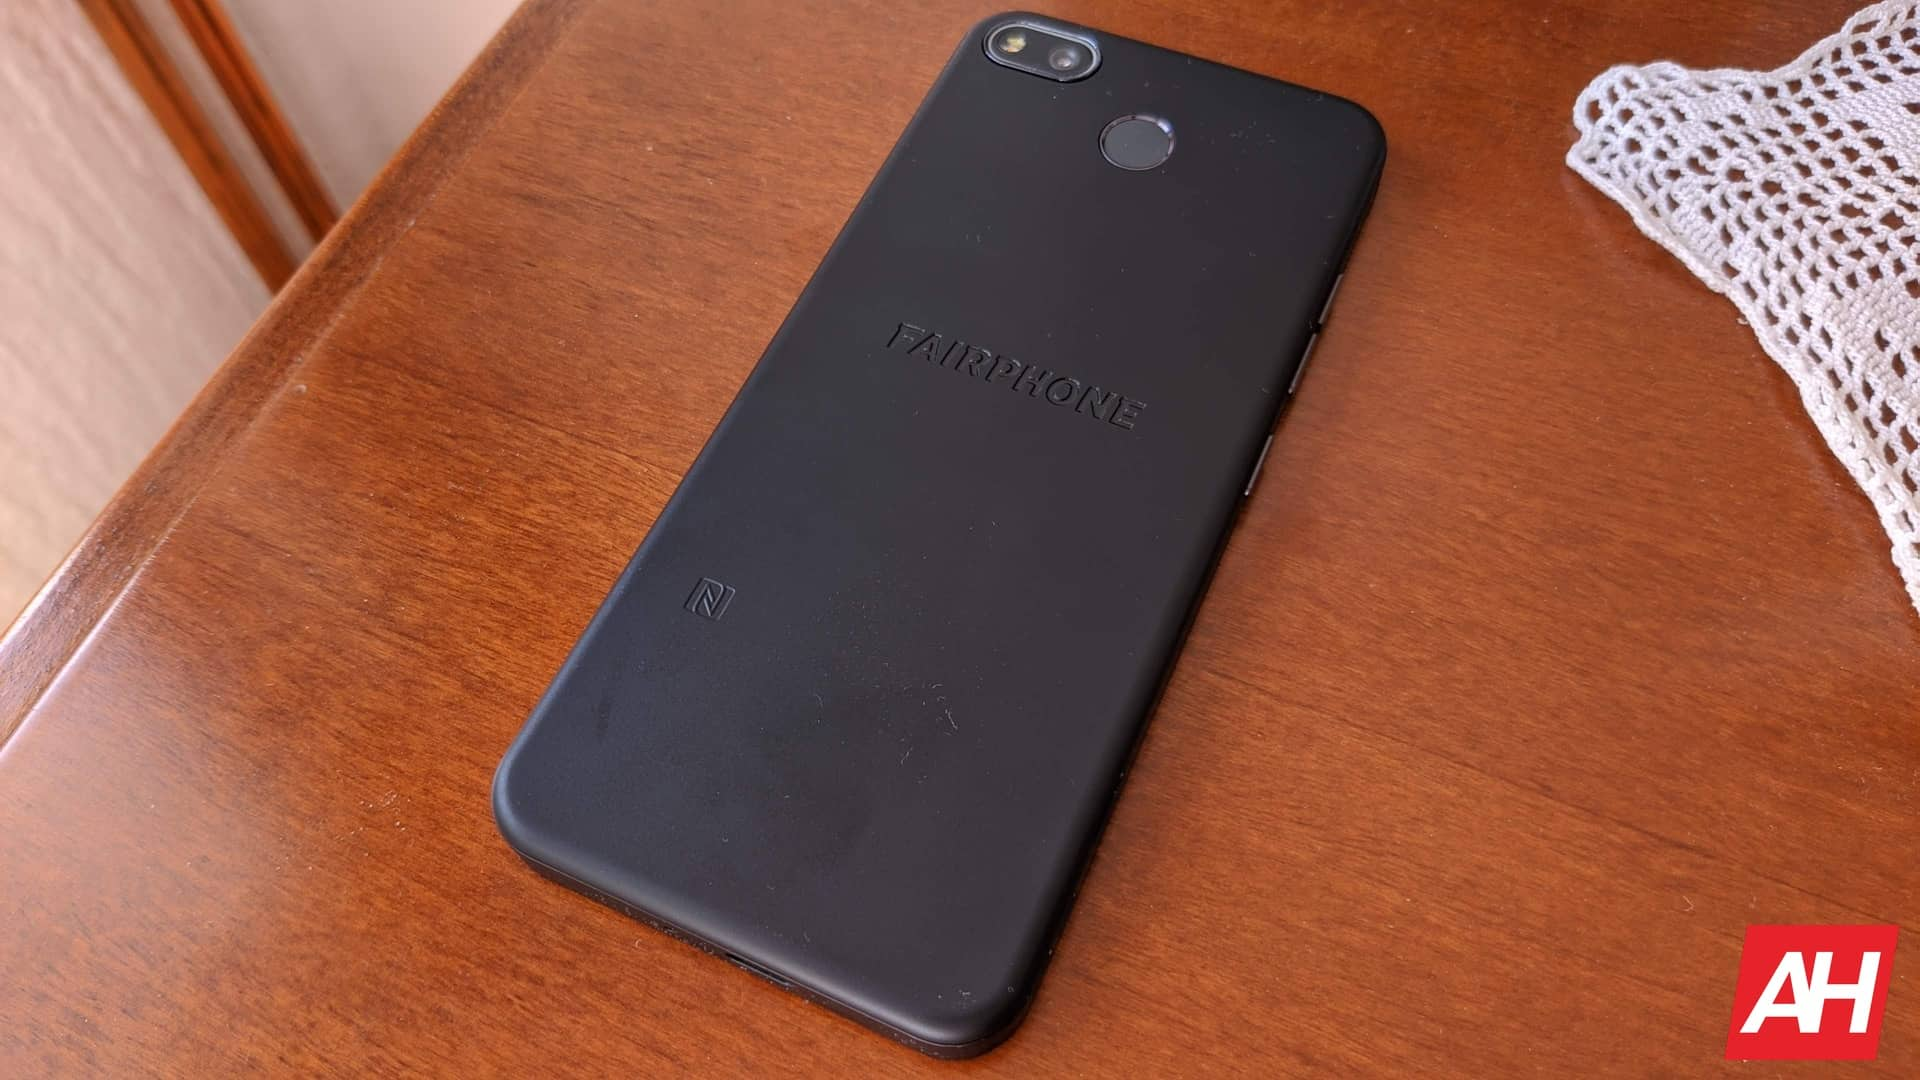 AH Fairphone 3 Plus image 7